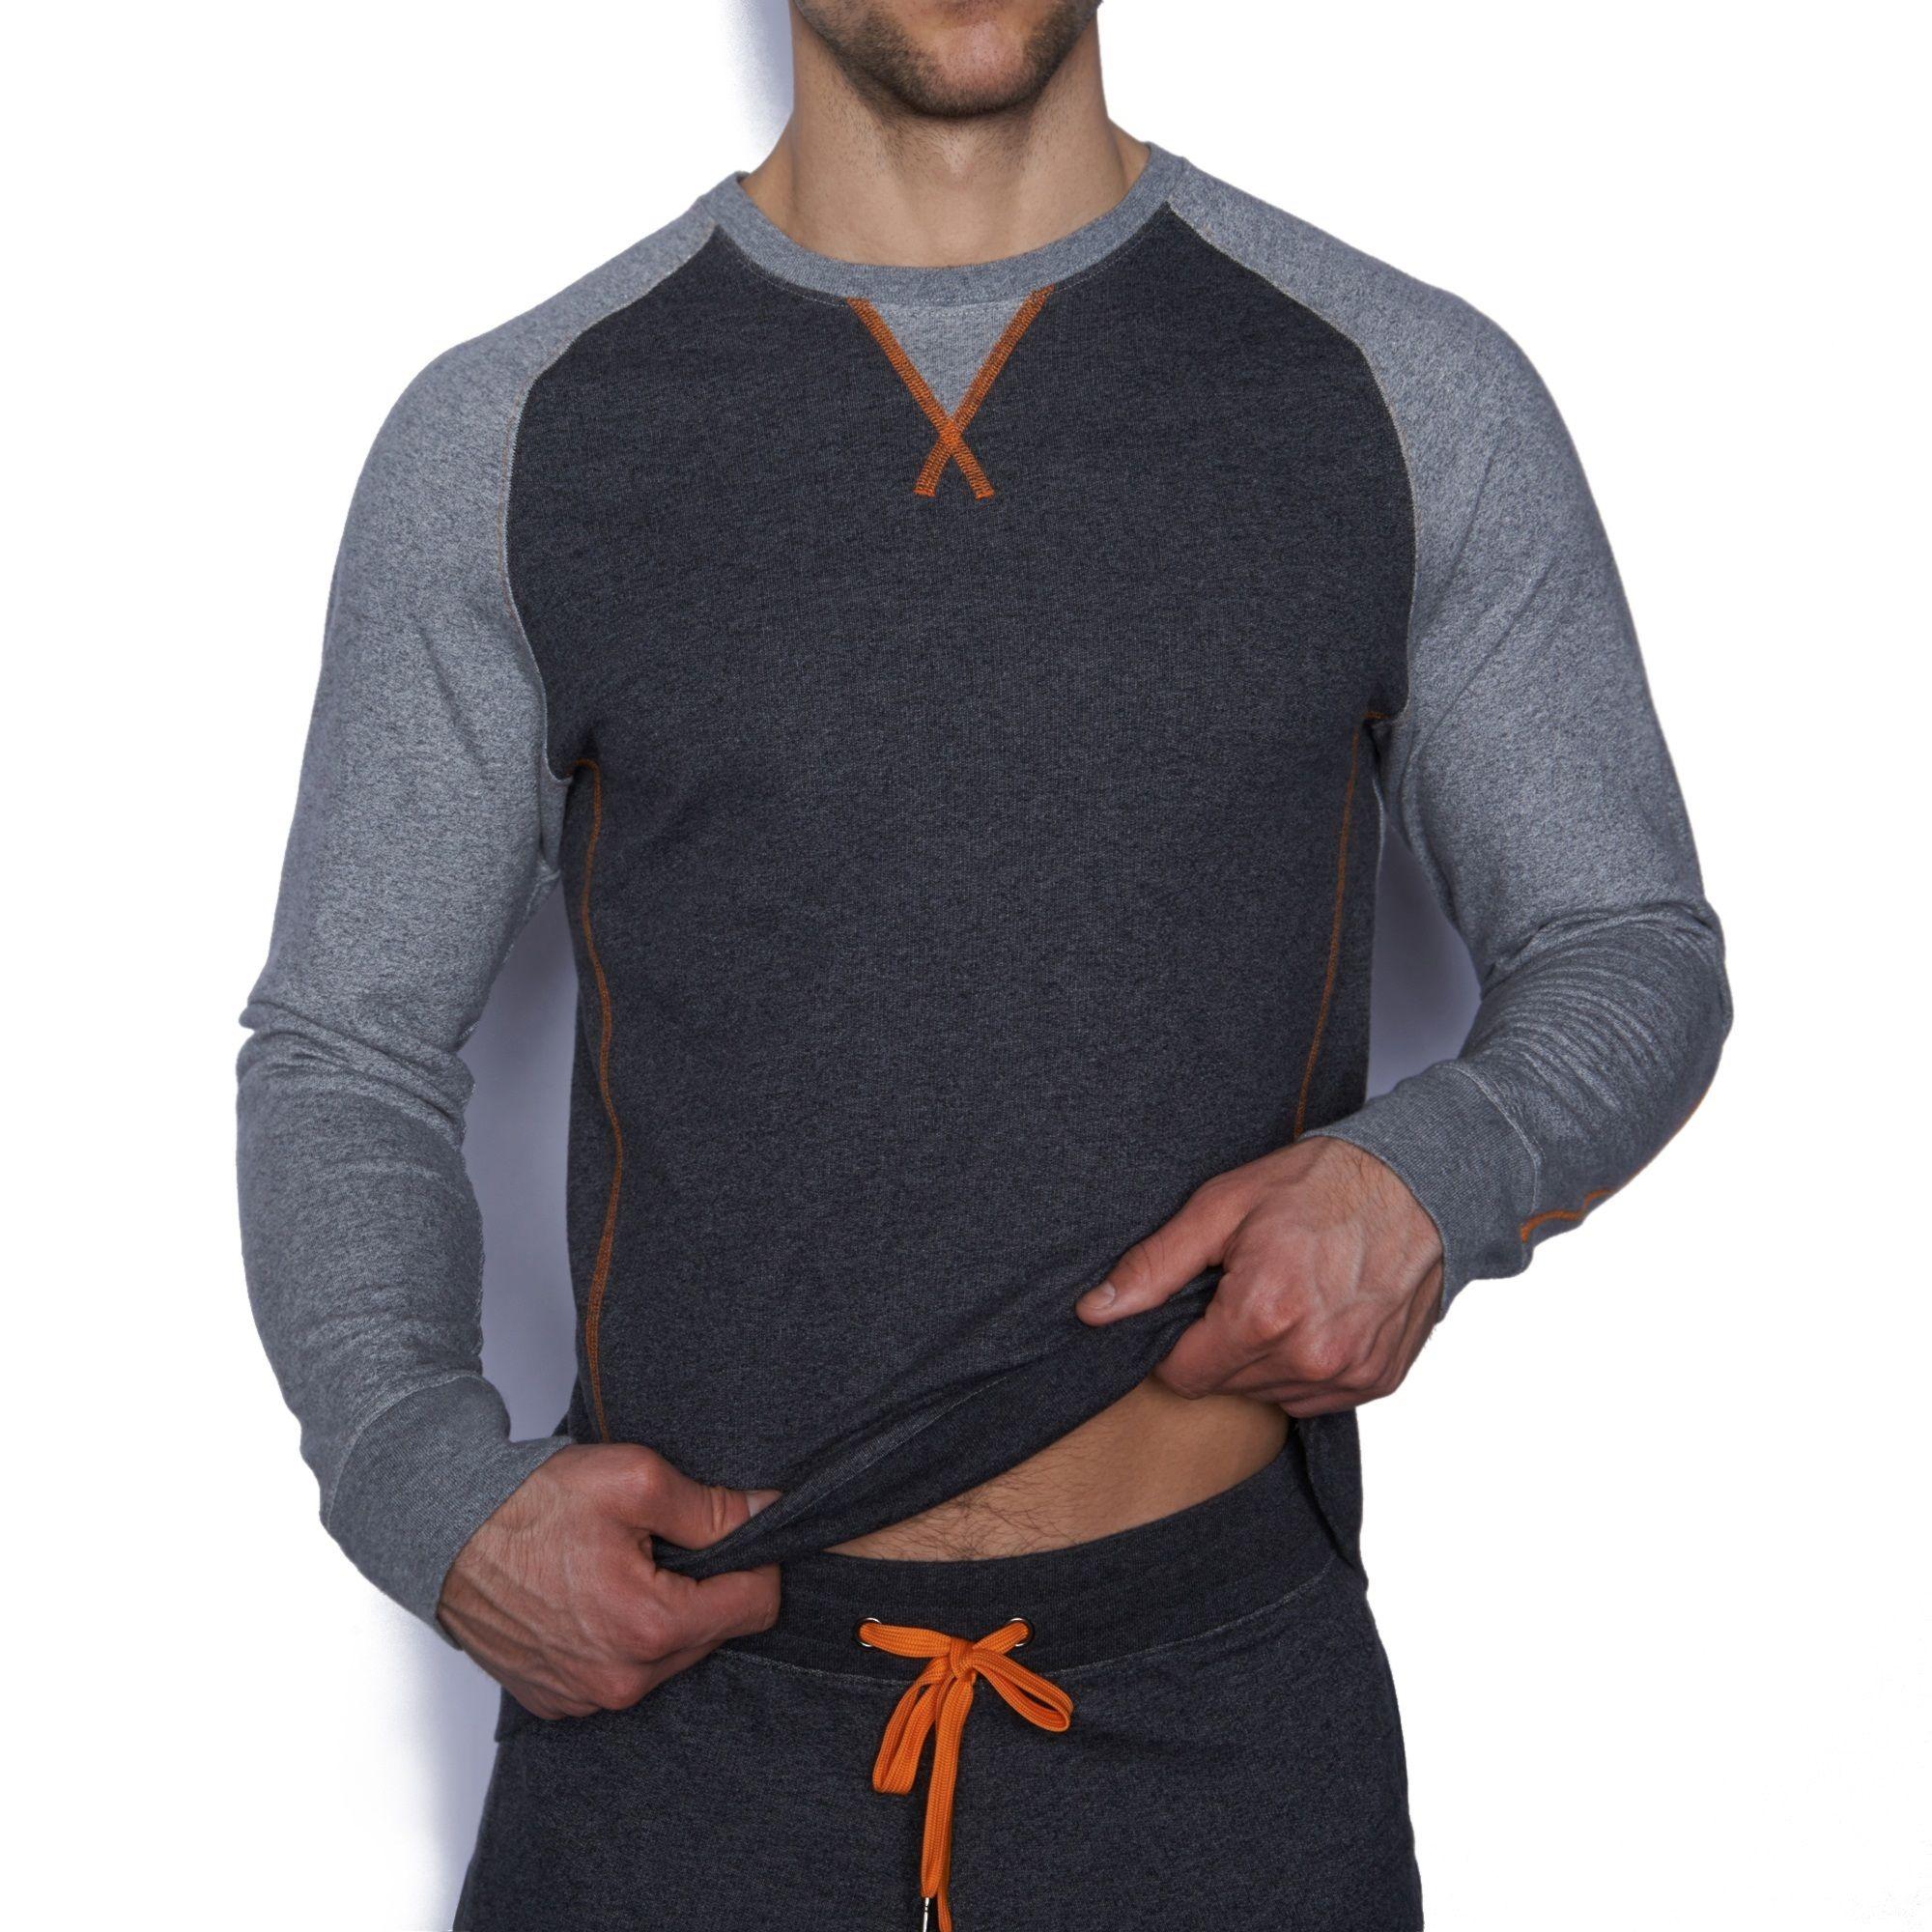 C-IN2 Sweats Svelte Pant